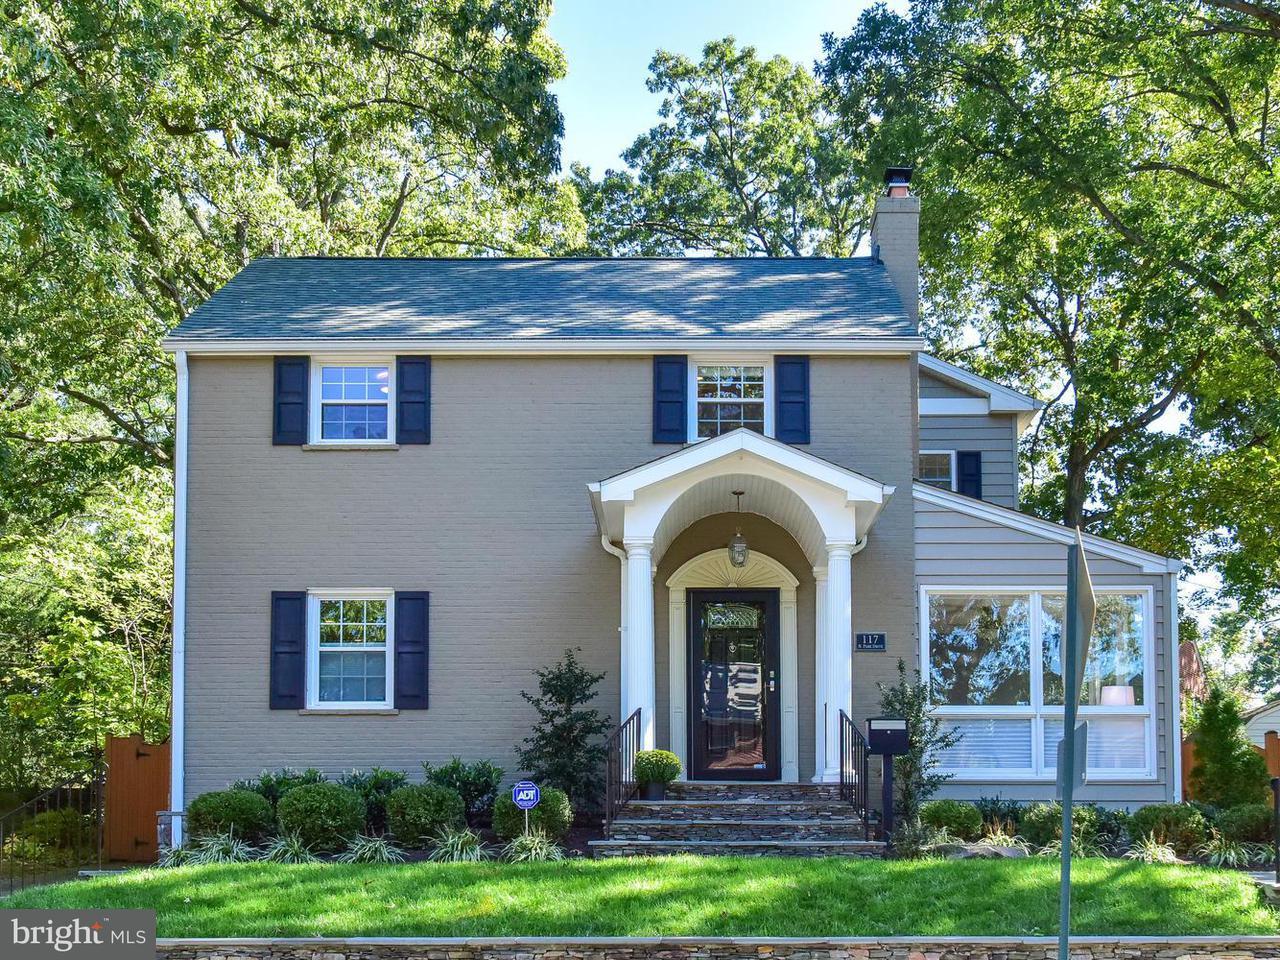 Single Family Home for Sale at 117 PARK DR N 117 PARK DR N Arlington, Virginia 22203 United States